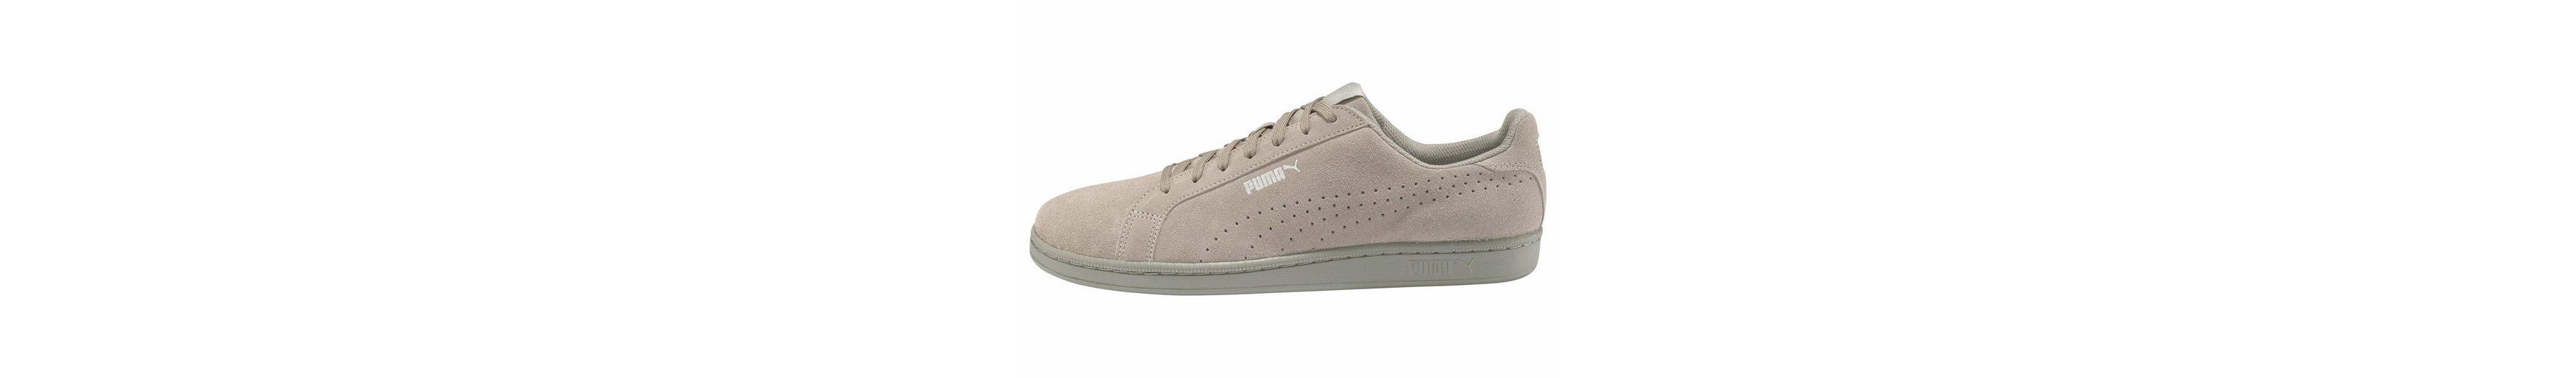 PUMA Smash Perf SD Sneaker Günstigste Online-Verkauf nDwM9rbu9t